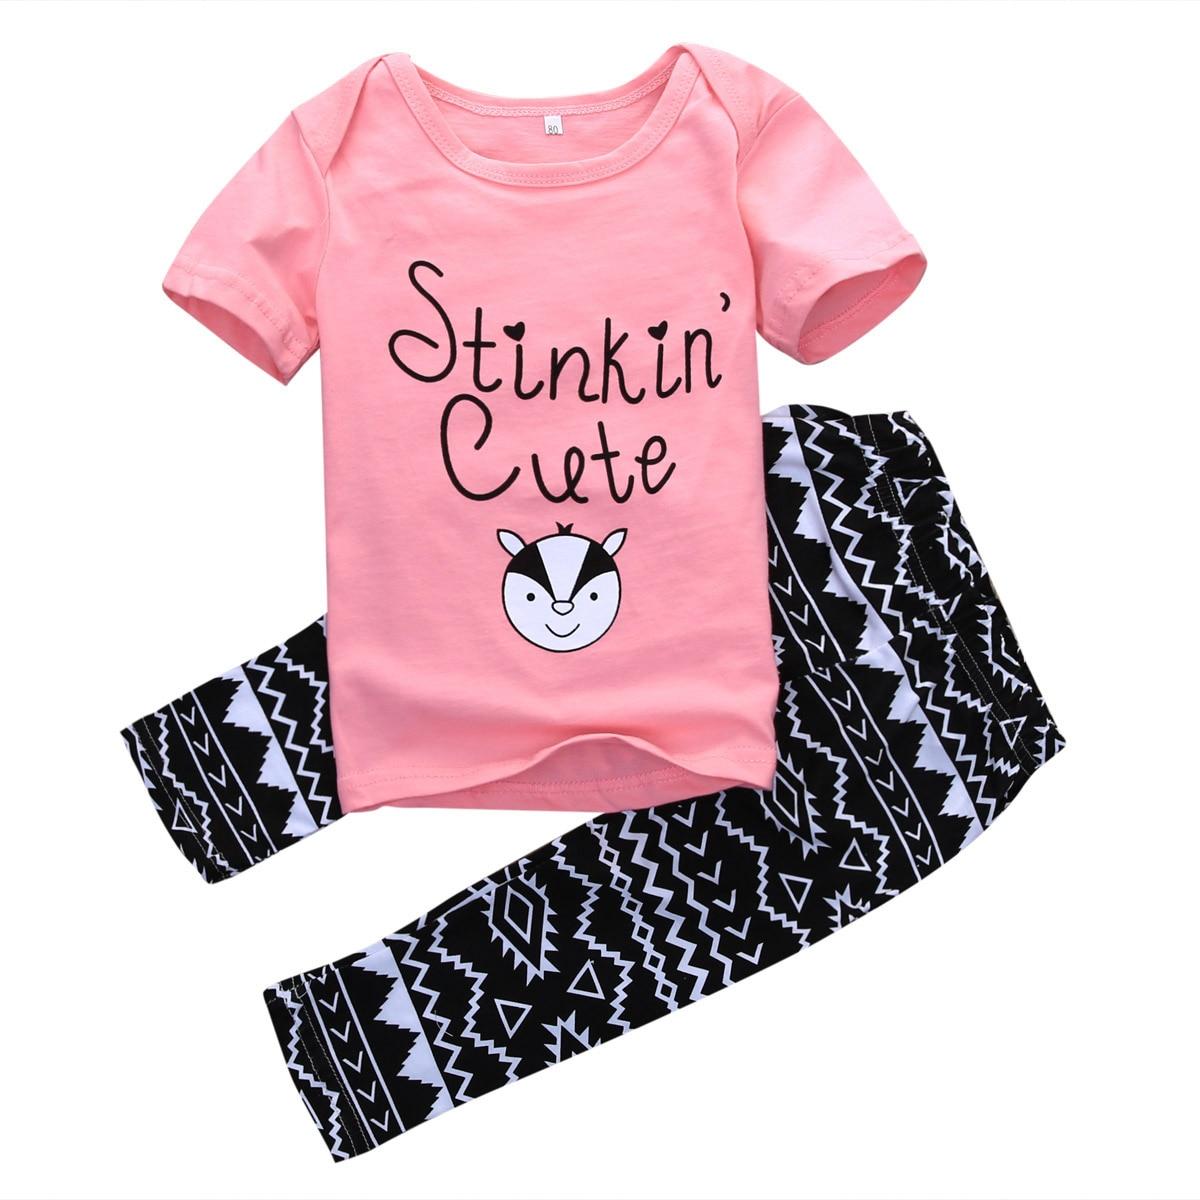 Aliexpress com buy 2016 new fashion baby girl clothes set 2pcs newborn infant baby kids girls